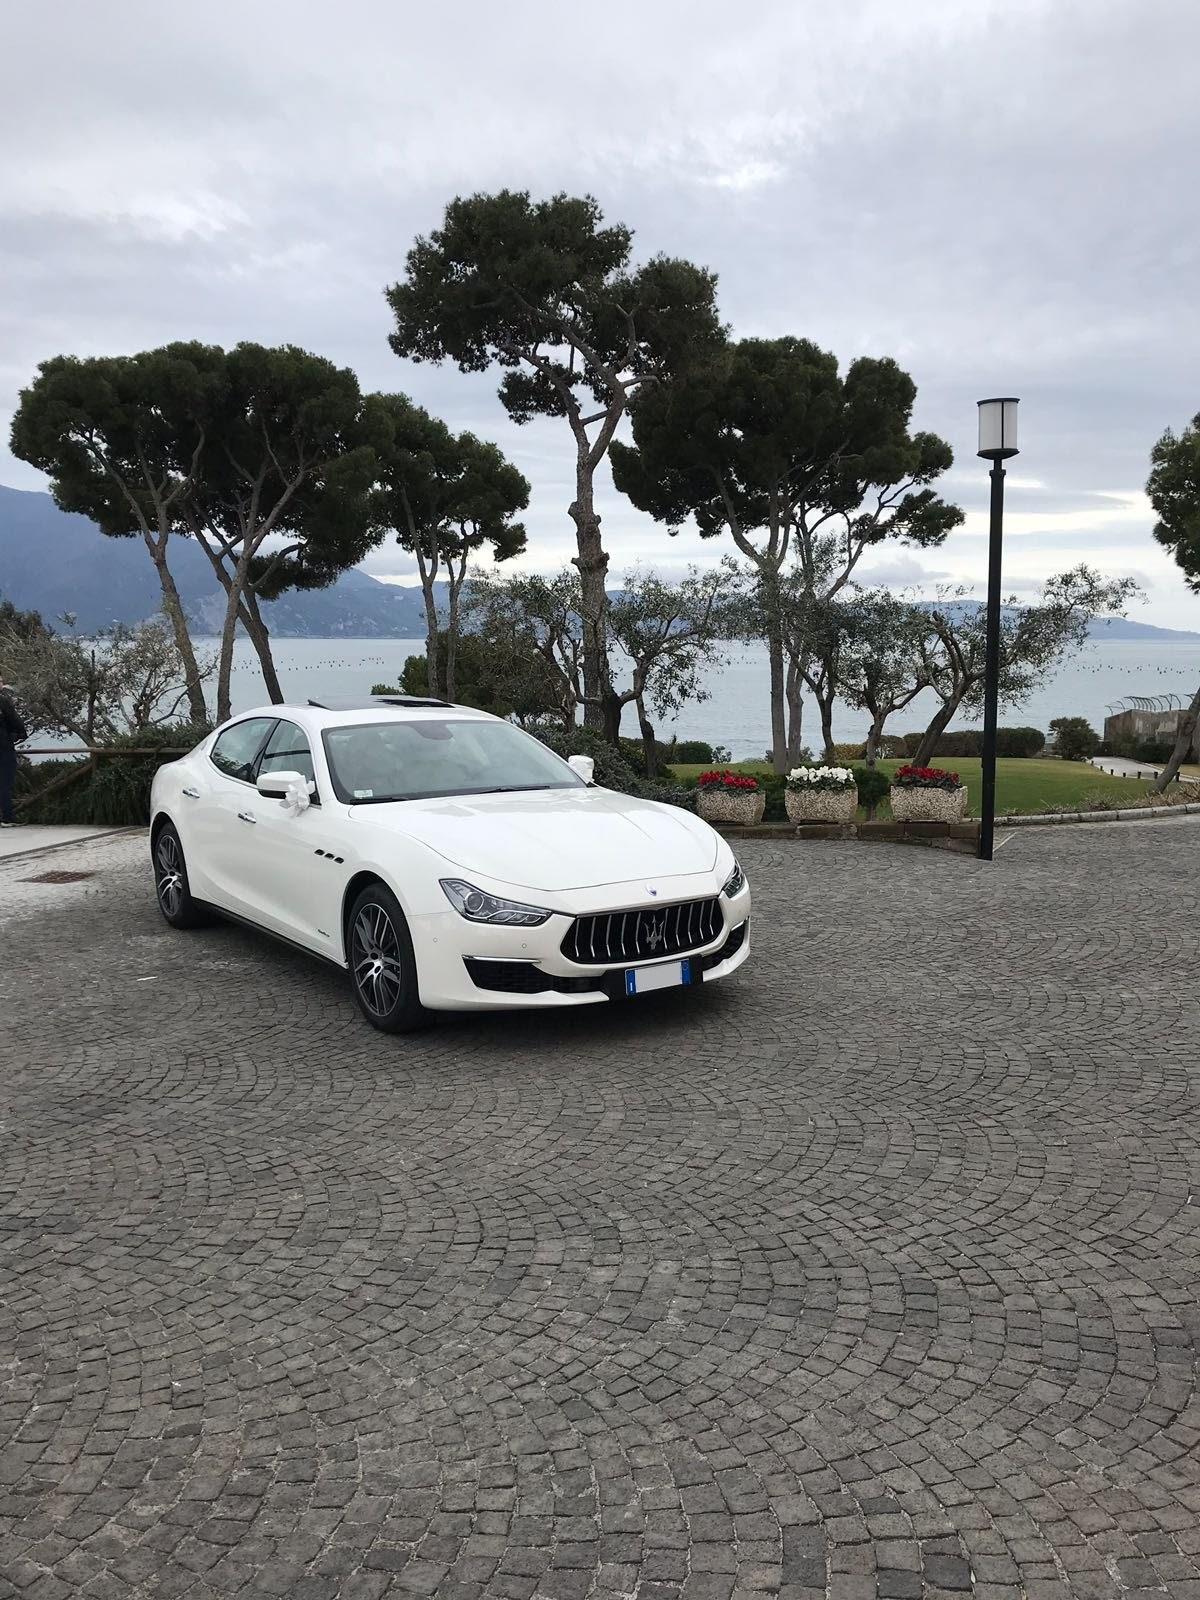 auto sposi Napoli | Maserati Ghibli | noleggio auto matrimoni Napoli prezzi